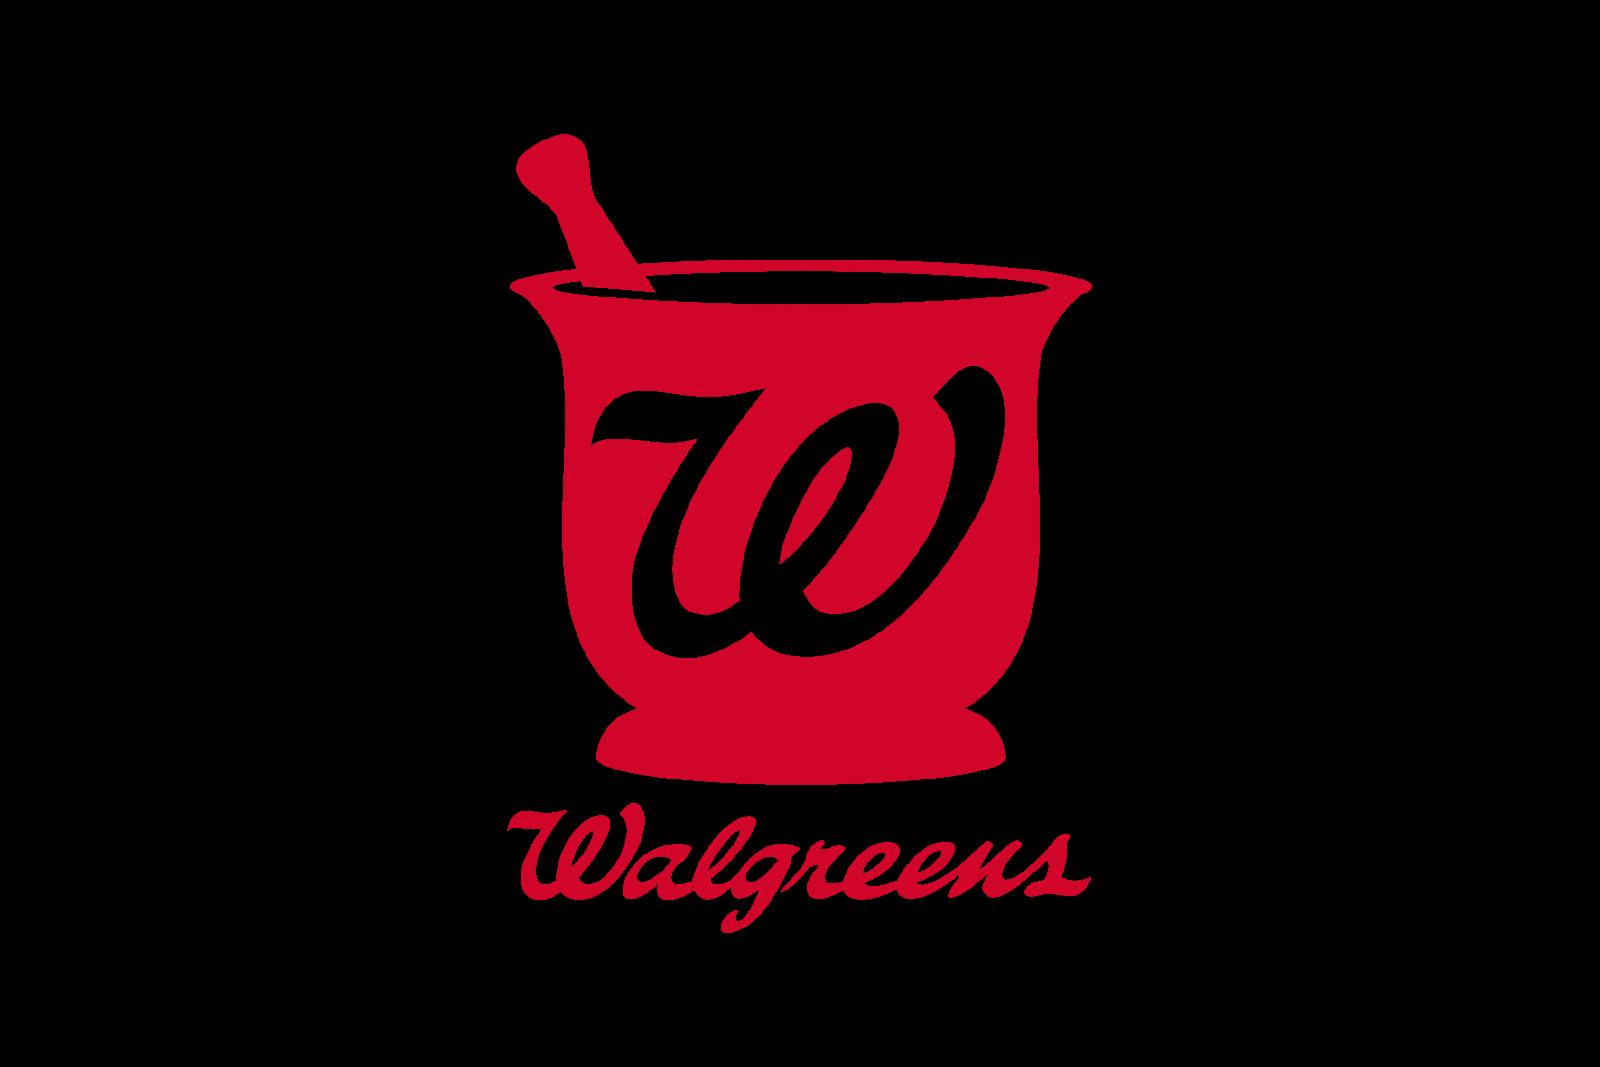 Logo Walgreens.png